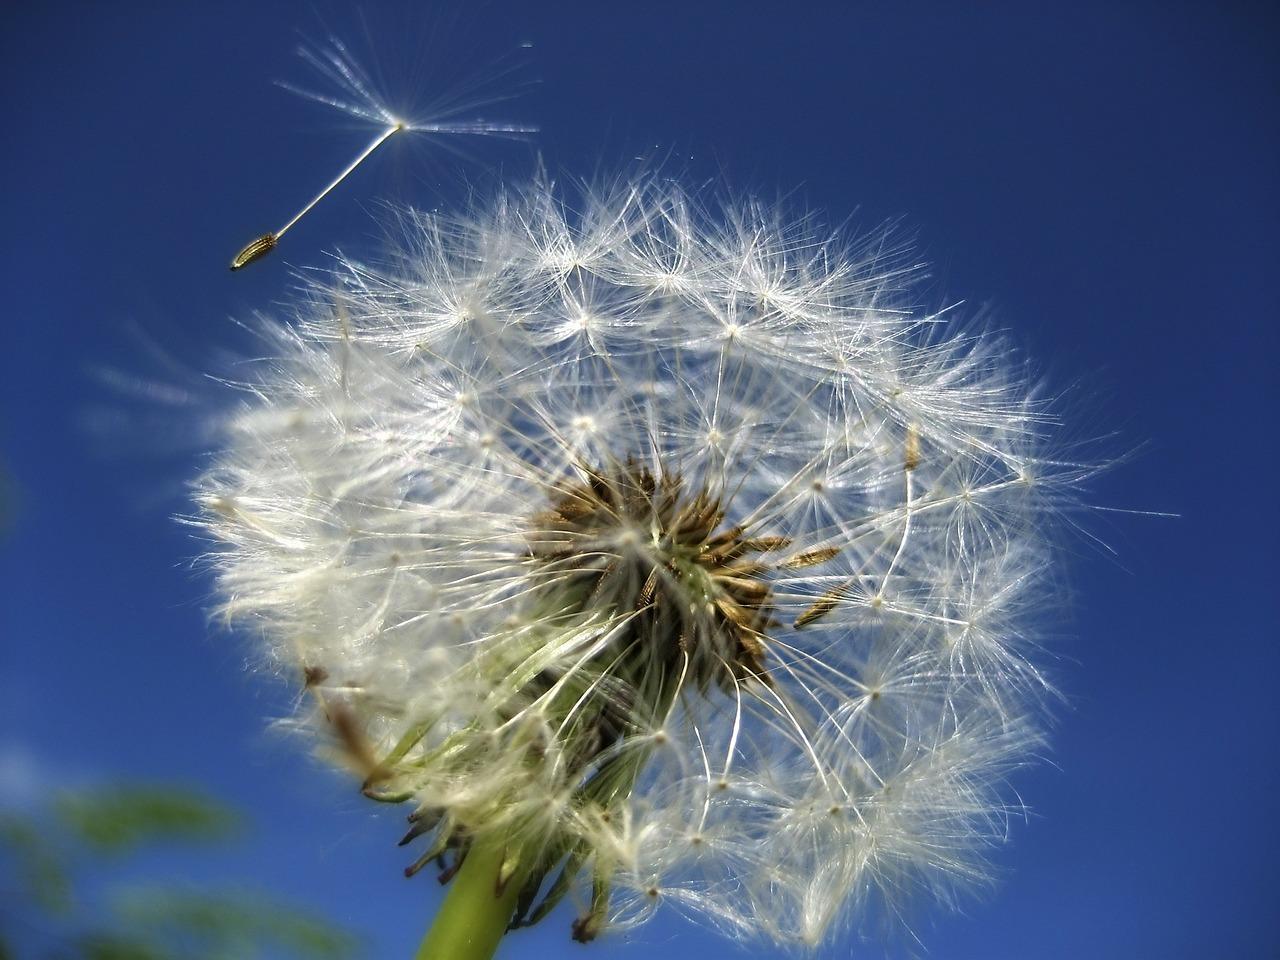 dandelion-53800_1280.jpg